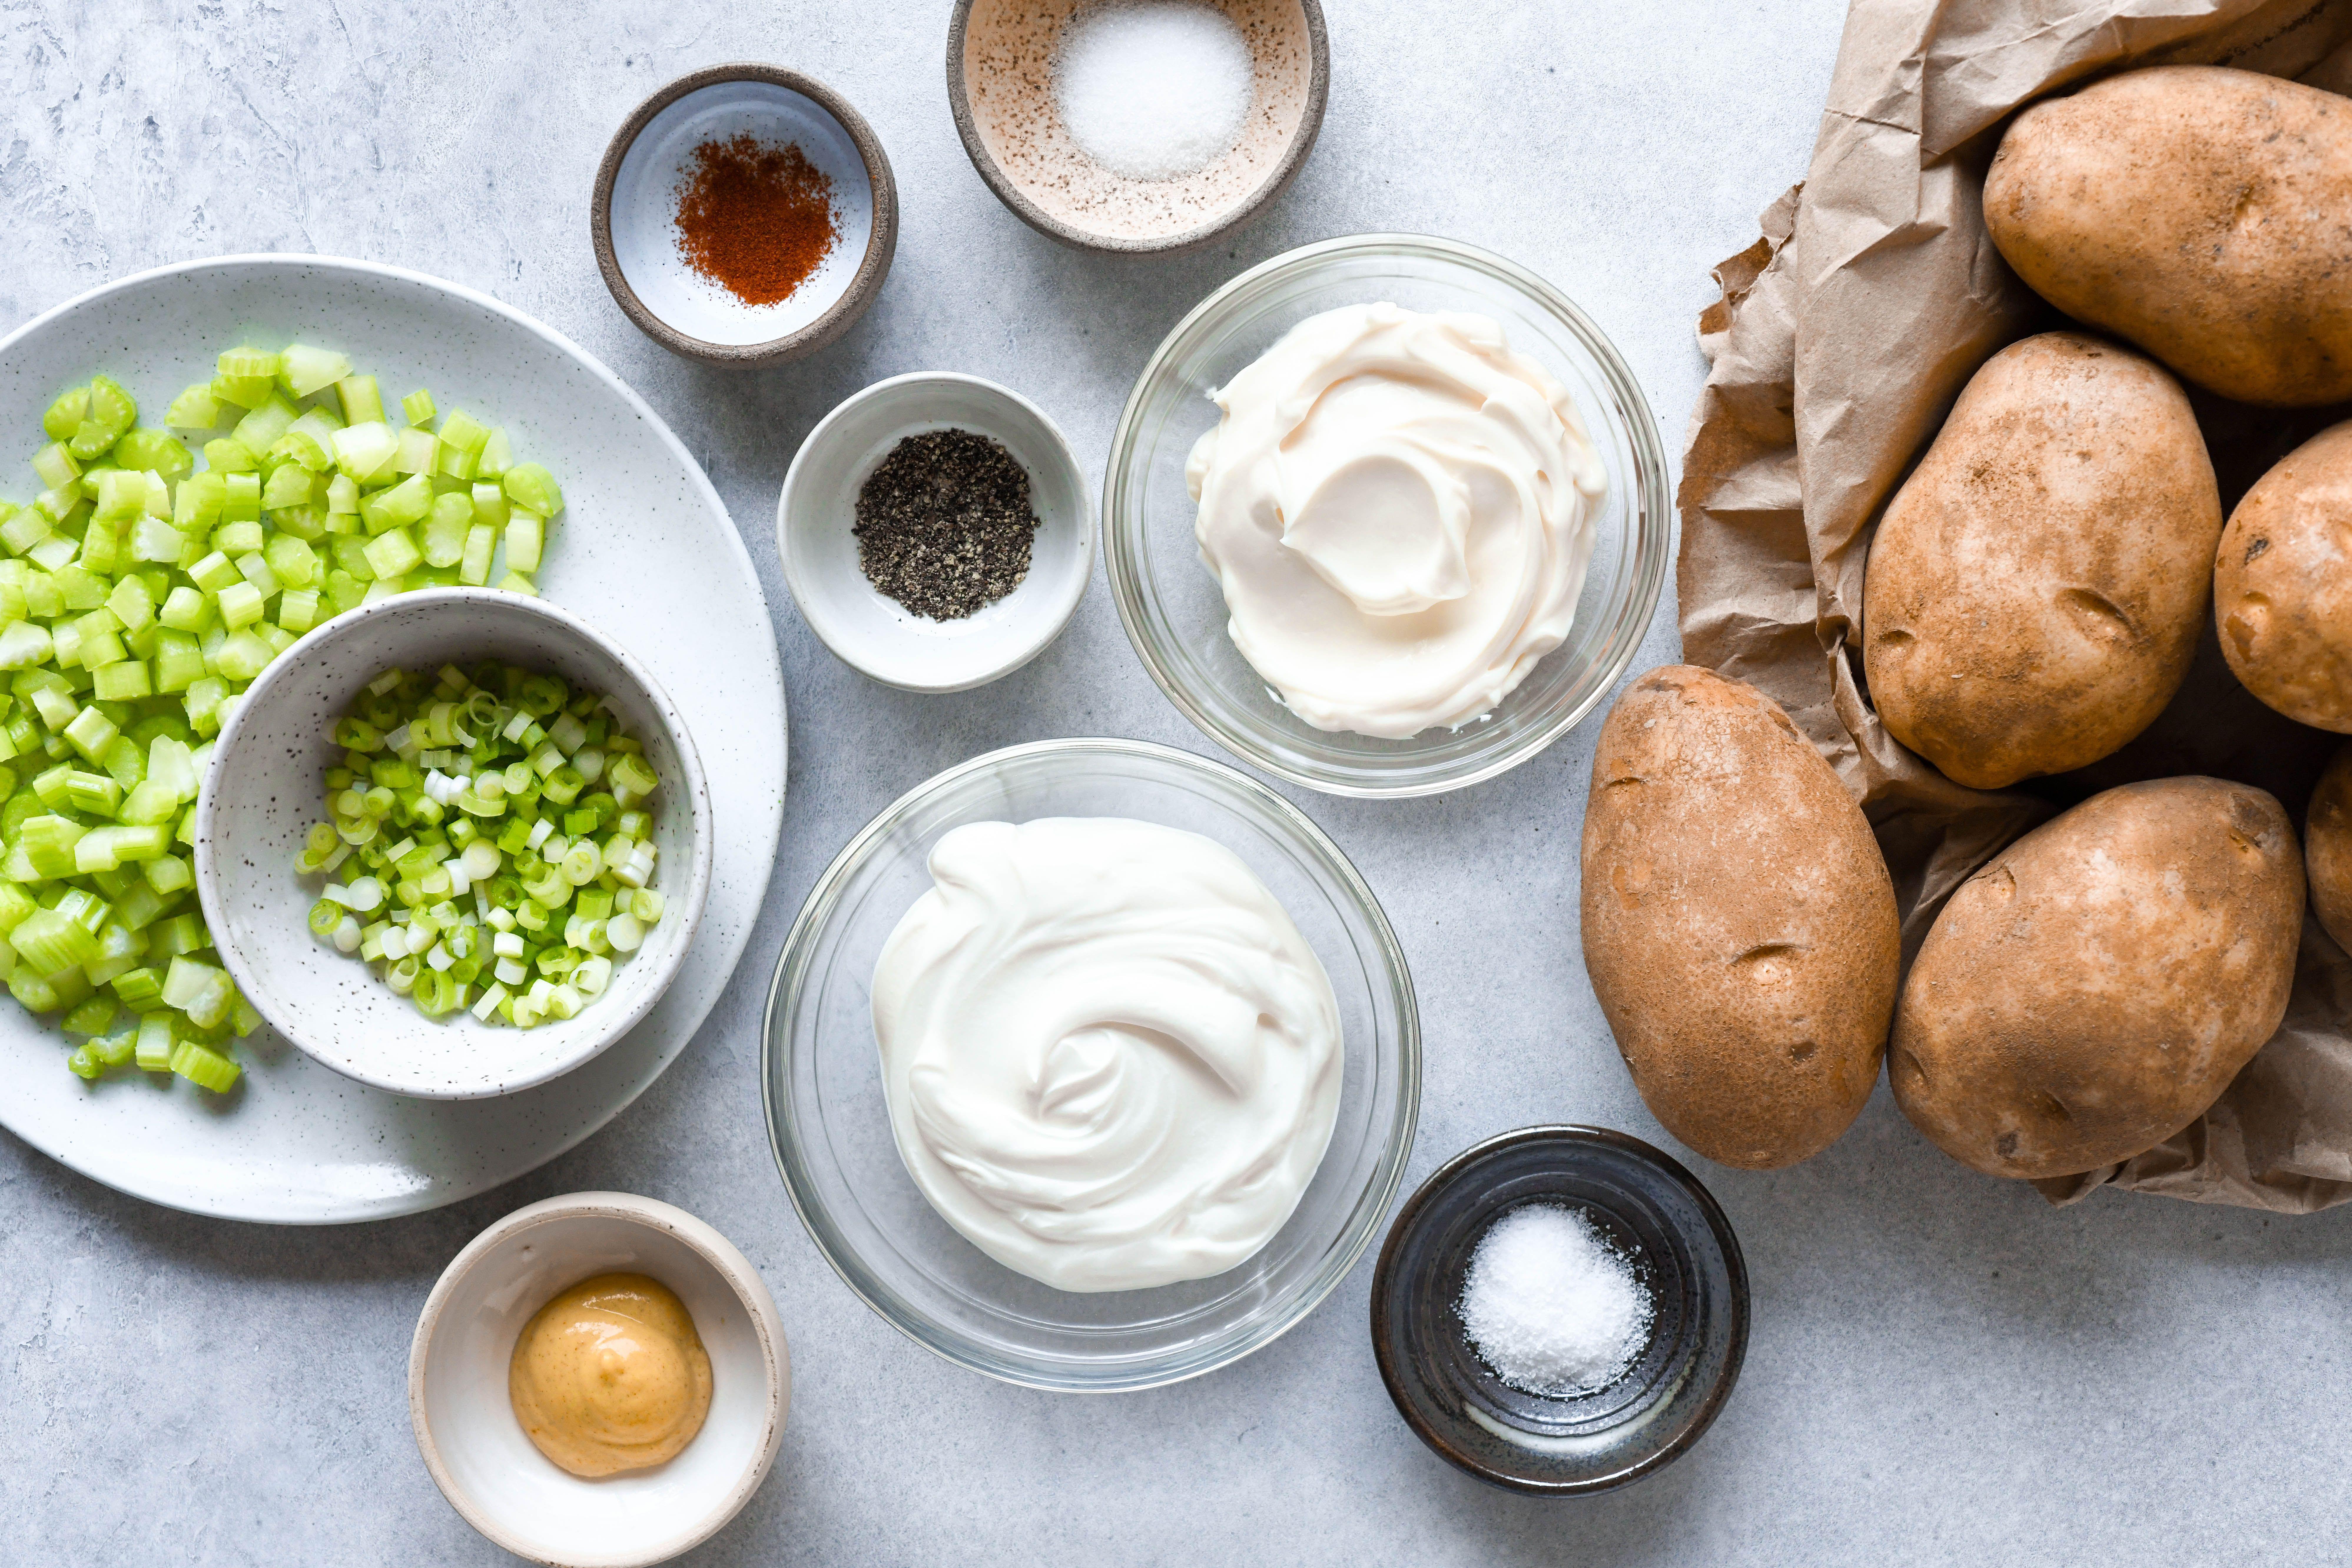 Potato Salad With Sour Cream And Dijon Mustard